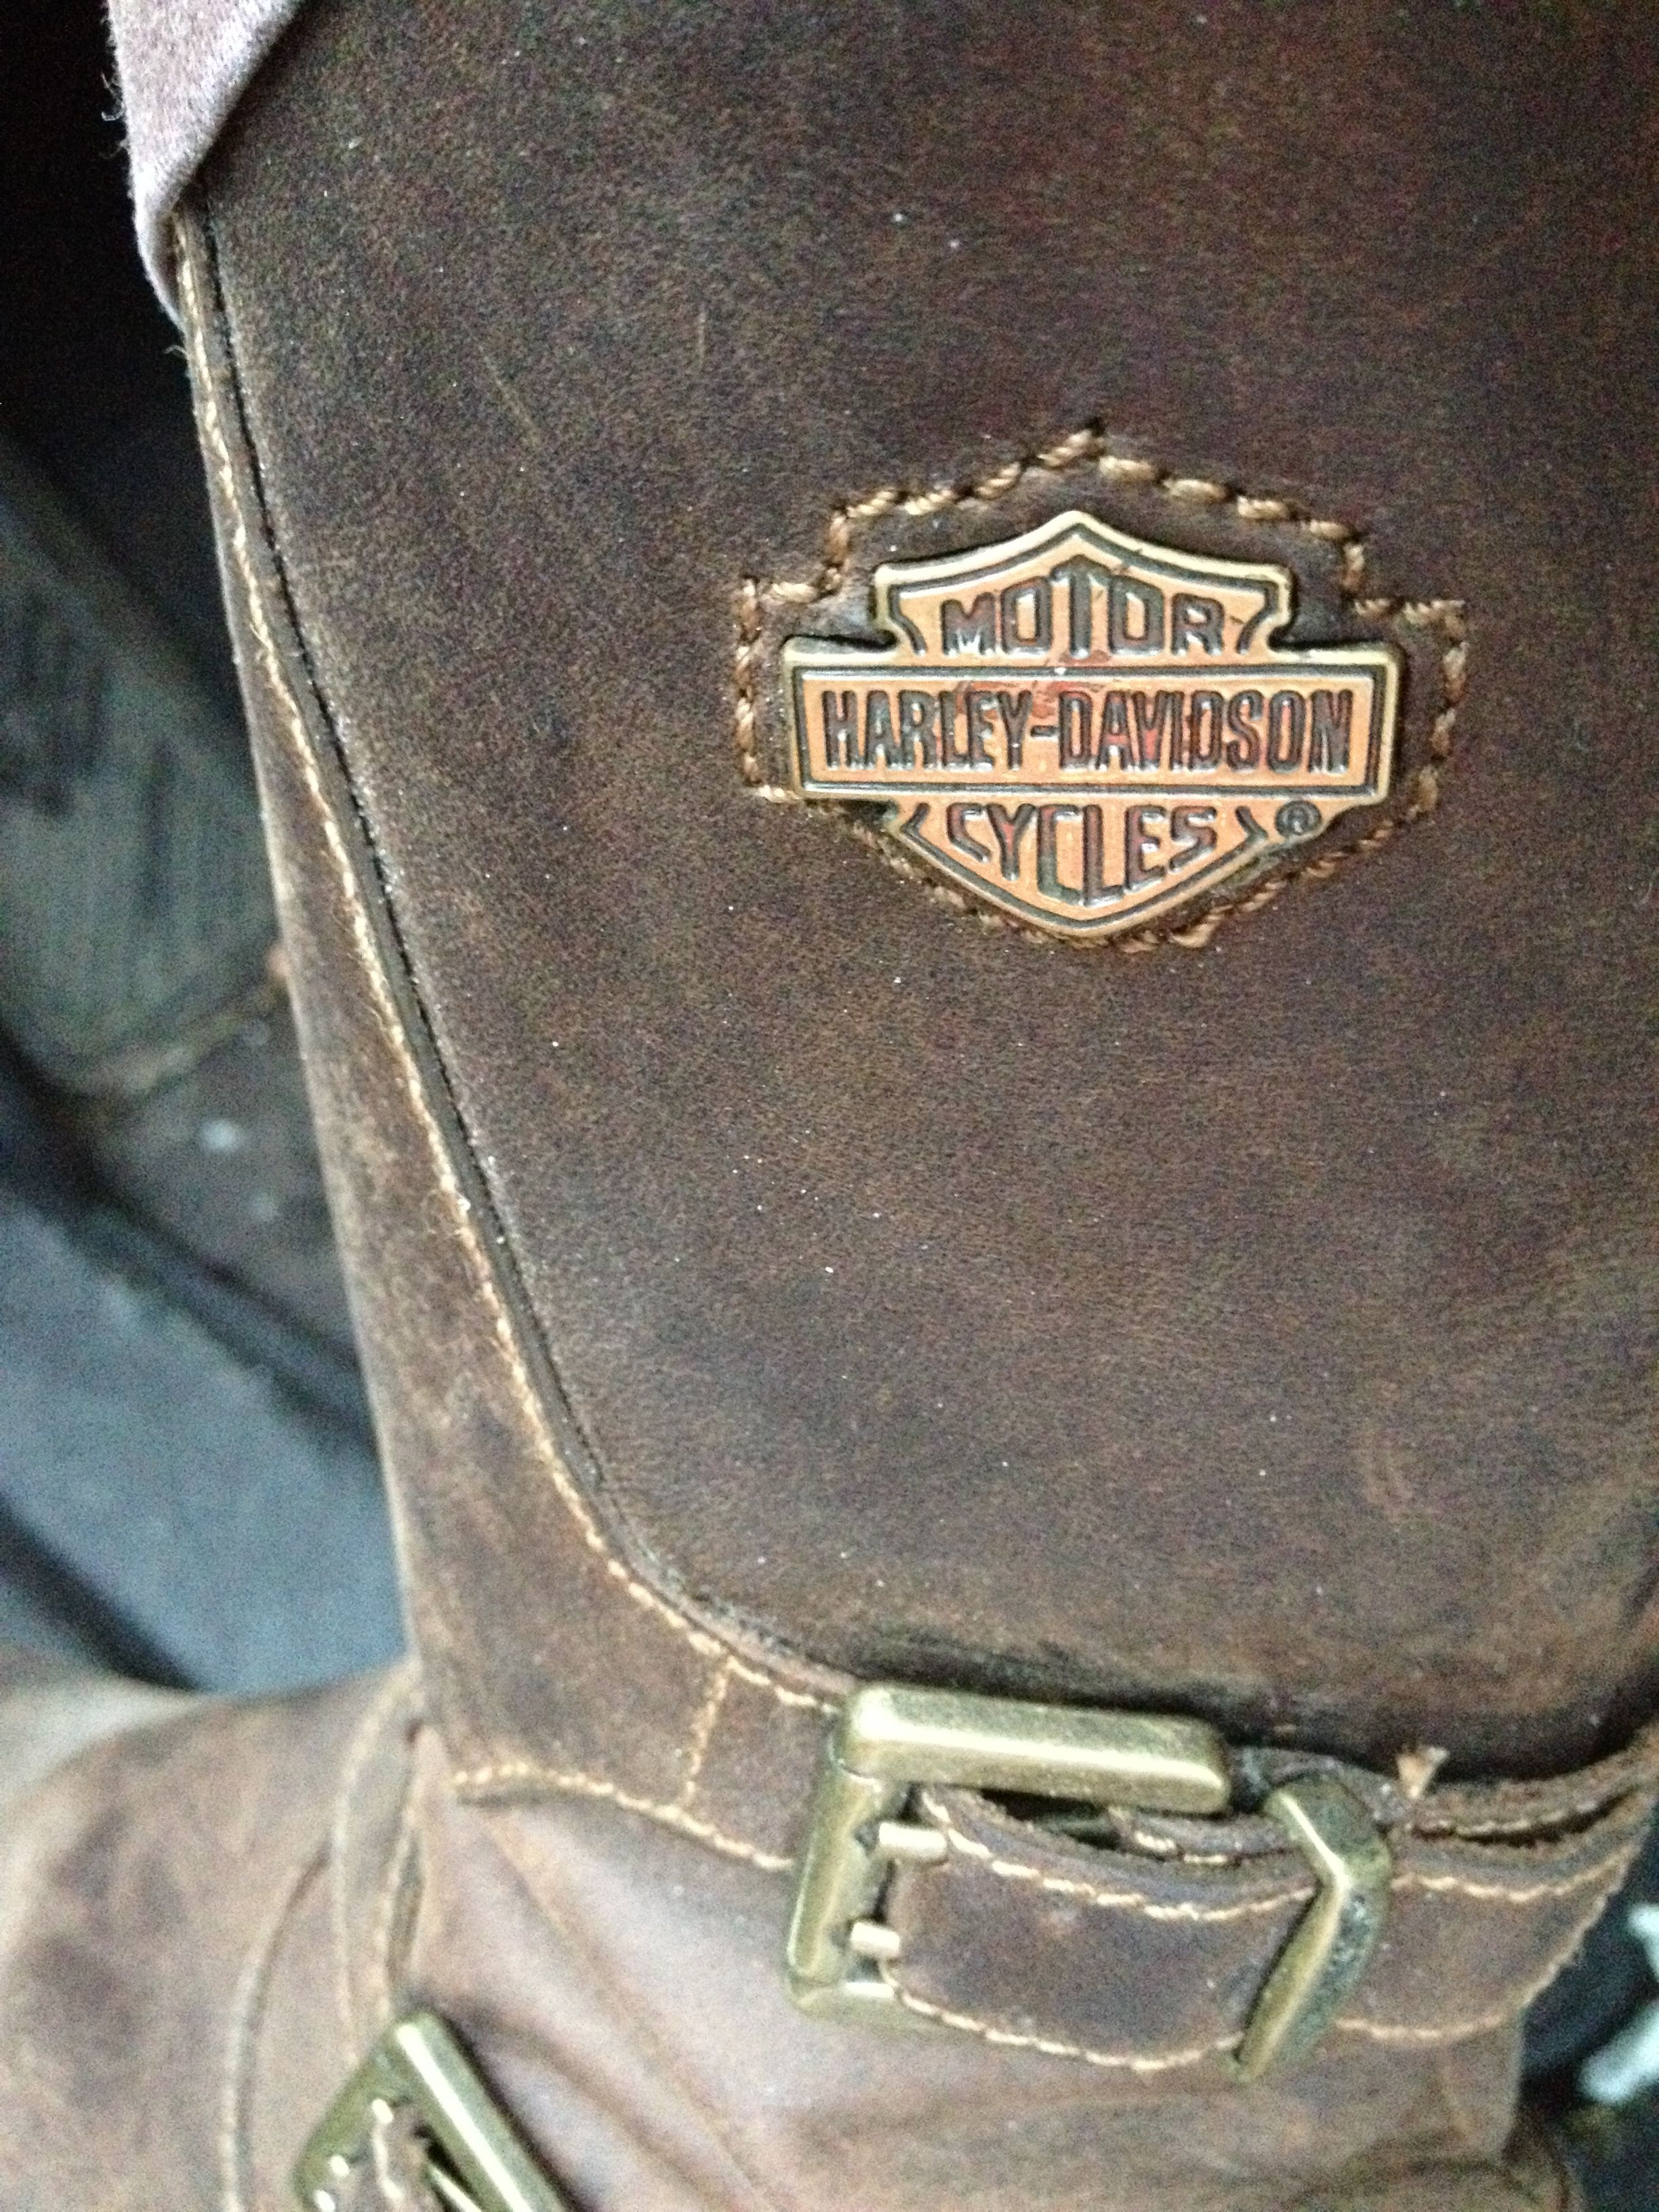 My favorite boots @harleydavidson